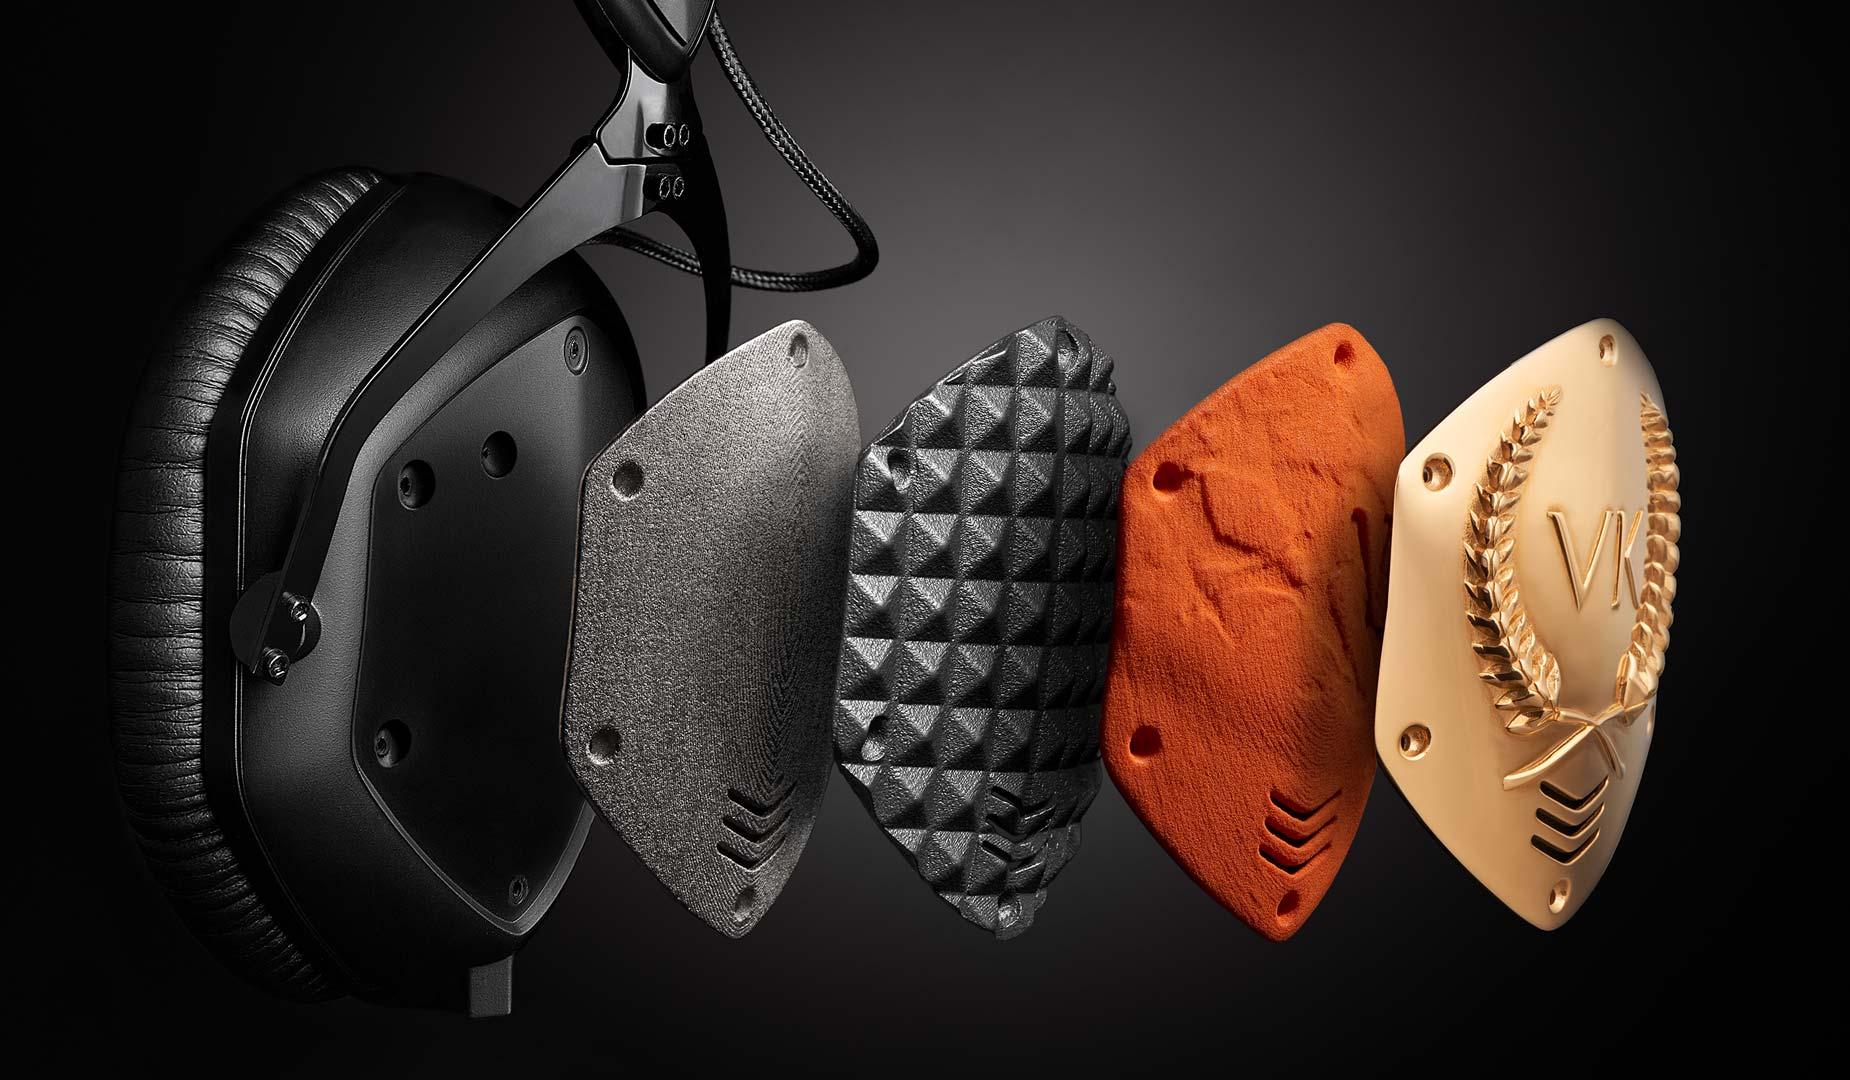 V-MODA 3D and Photo Headphone Shields Exploded